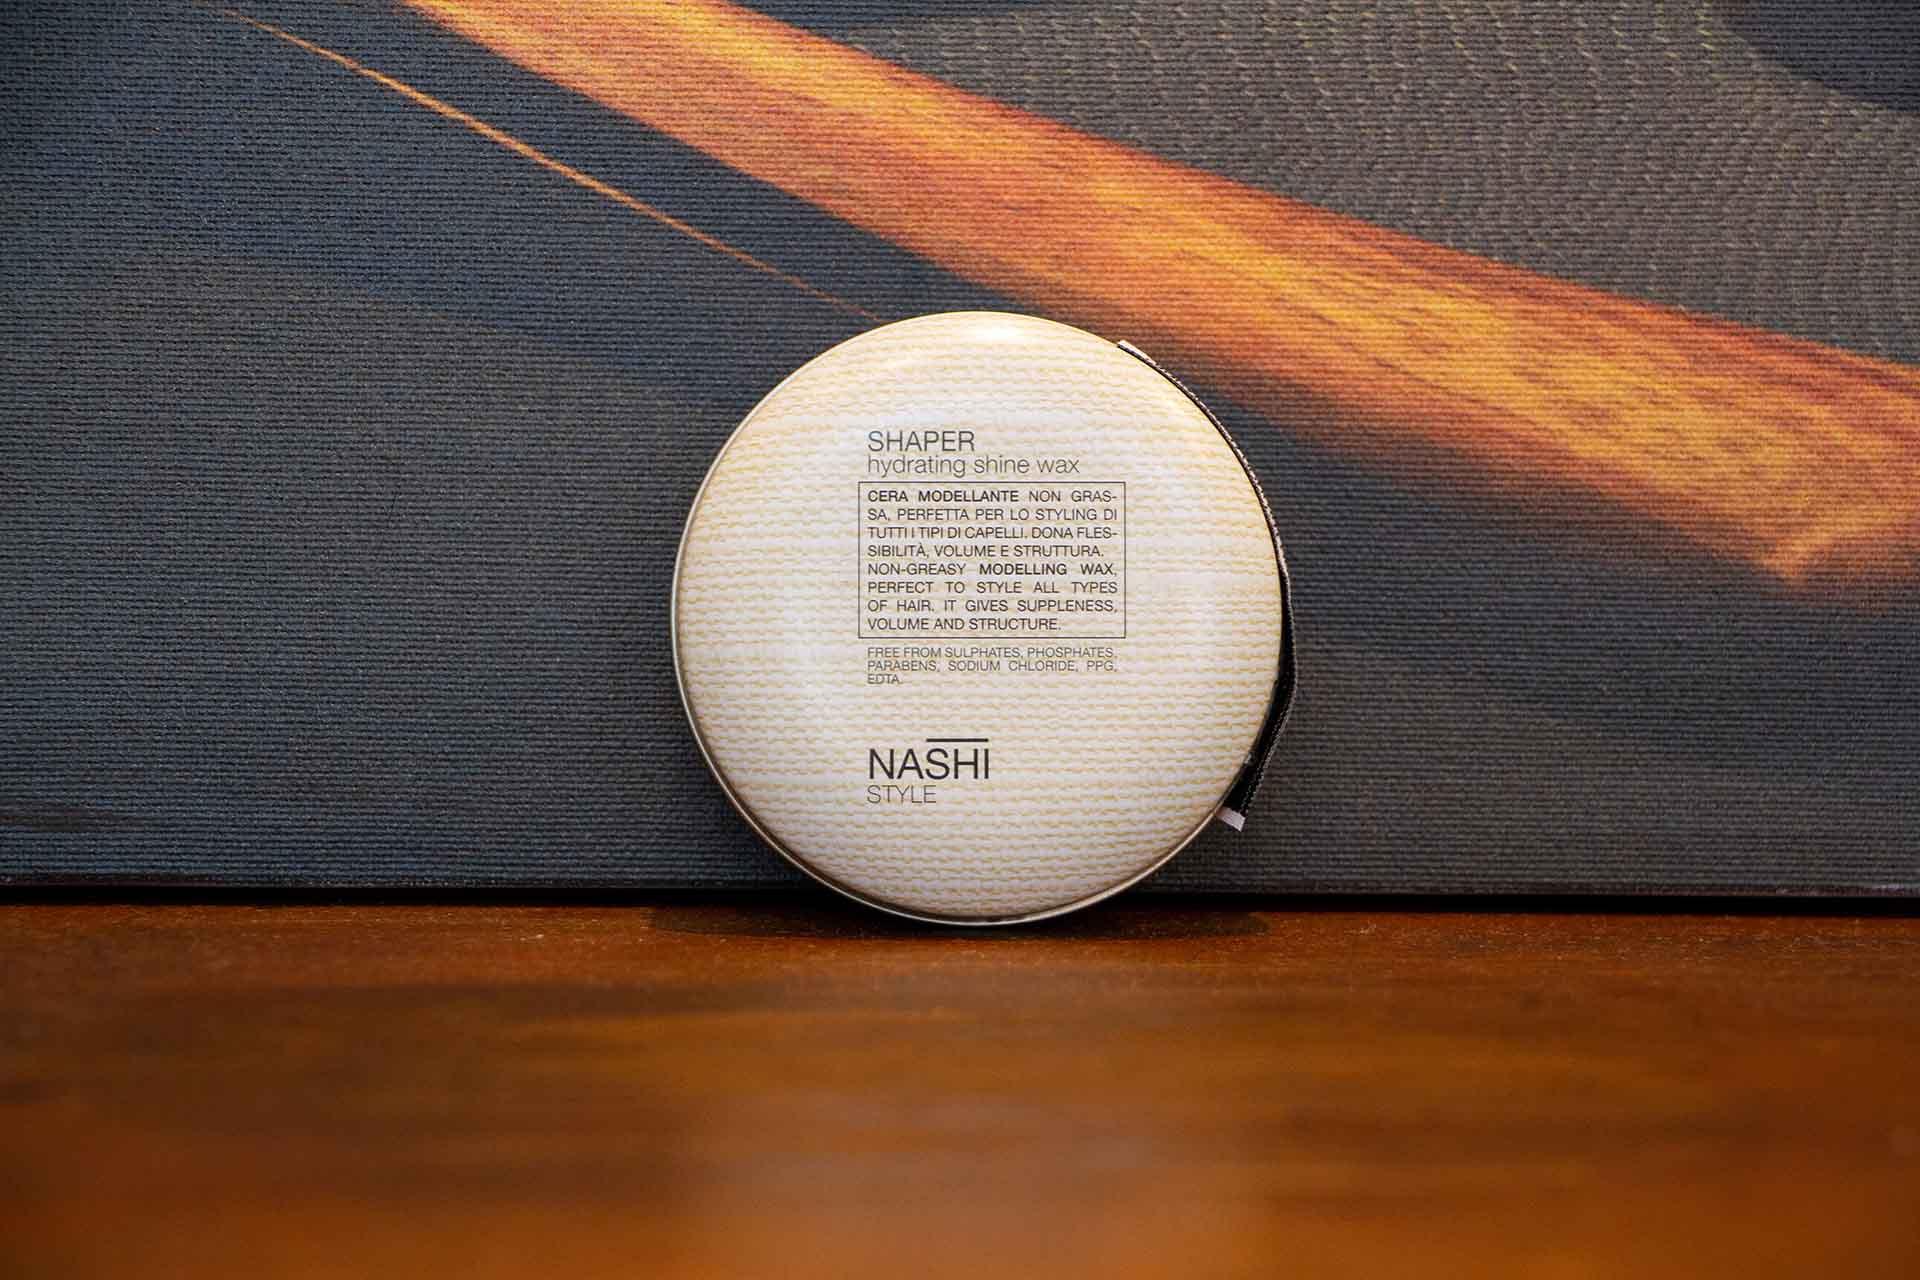 prodotti shine wax nashi diego staff parrucchieri spinea